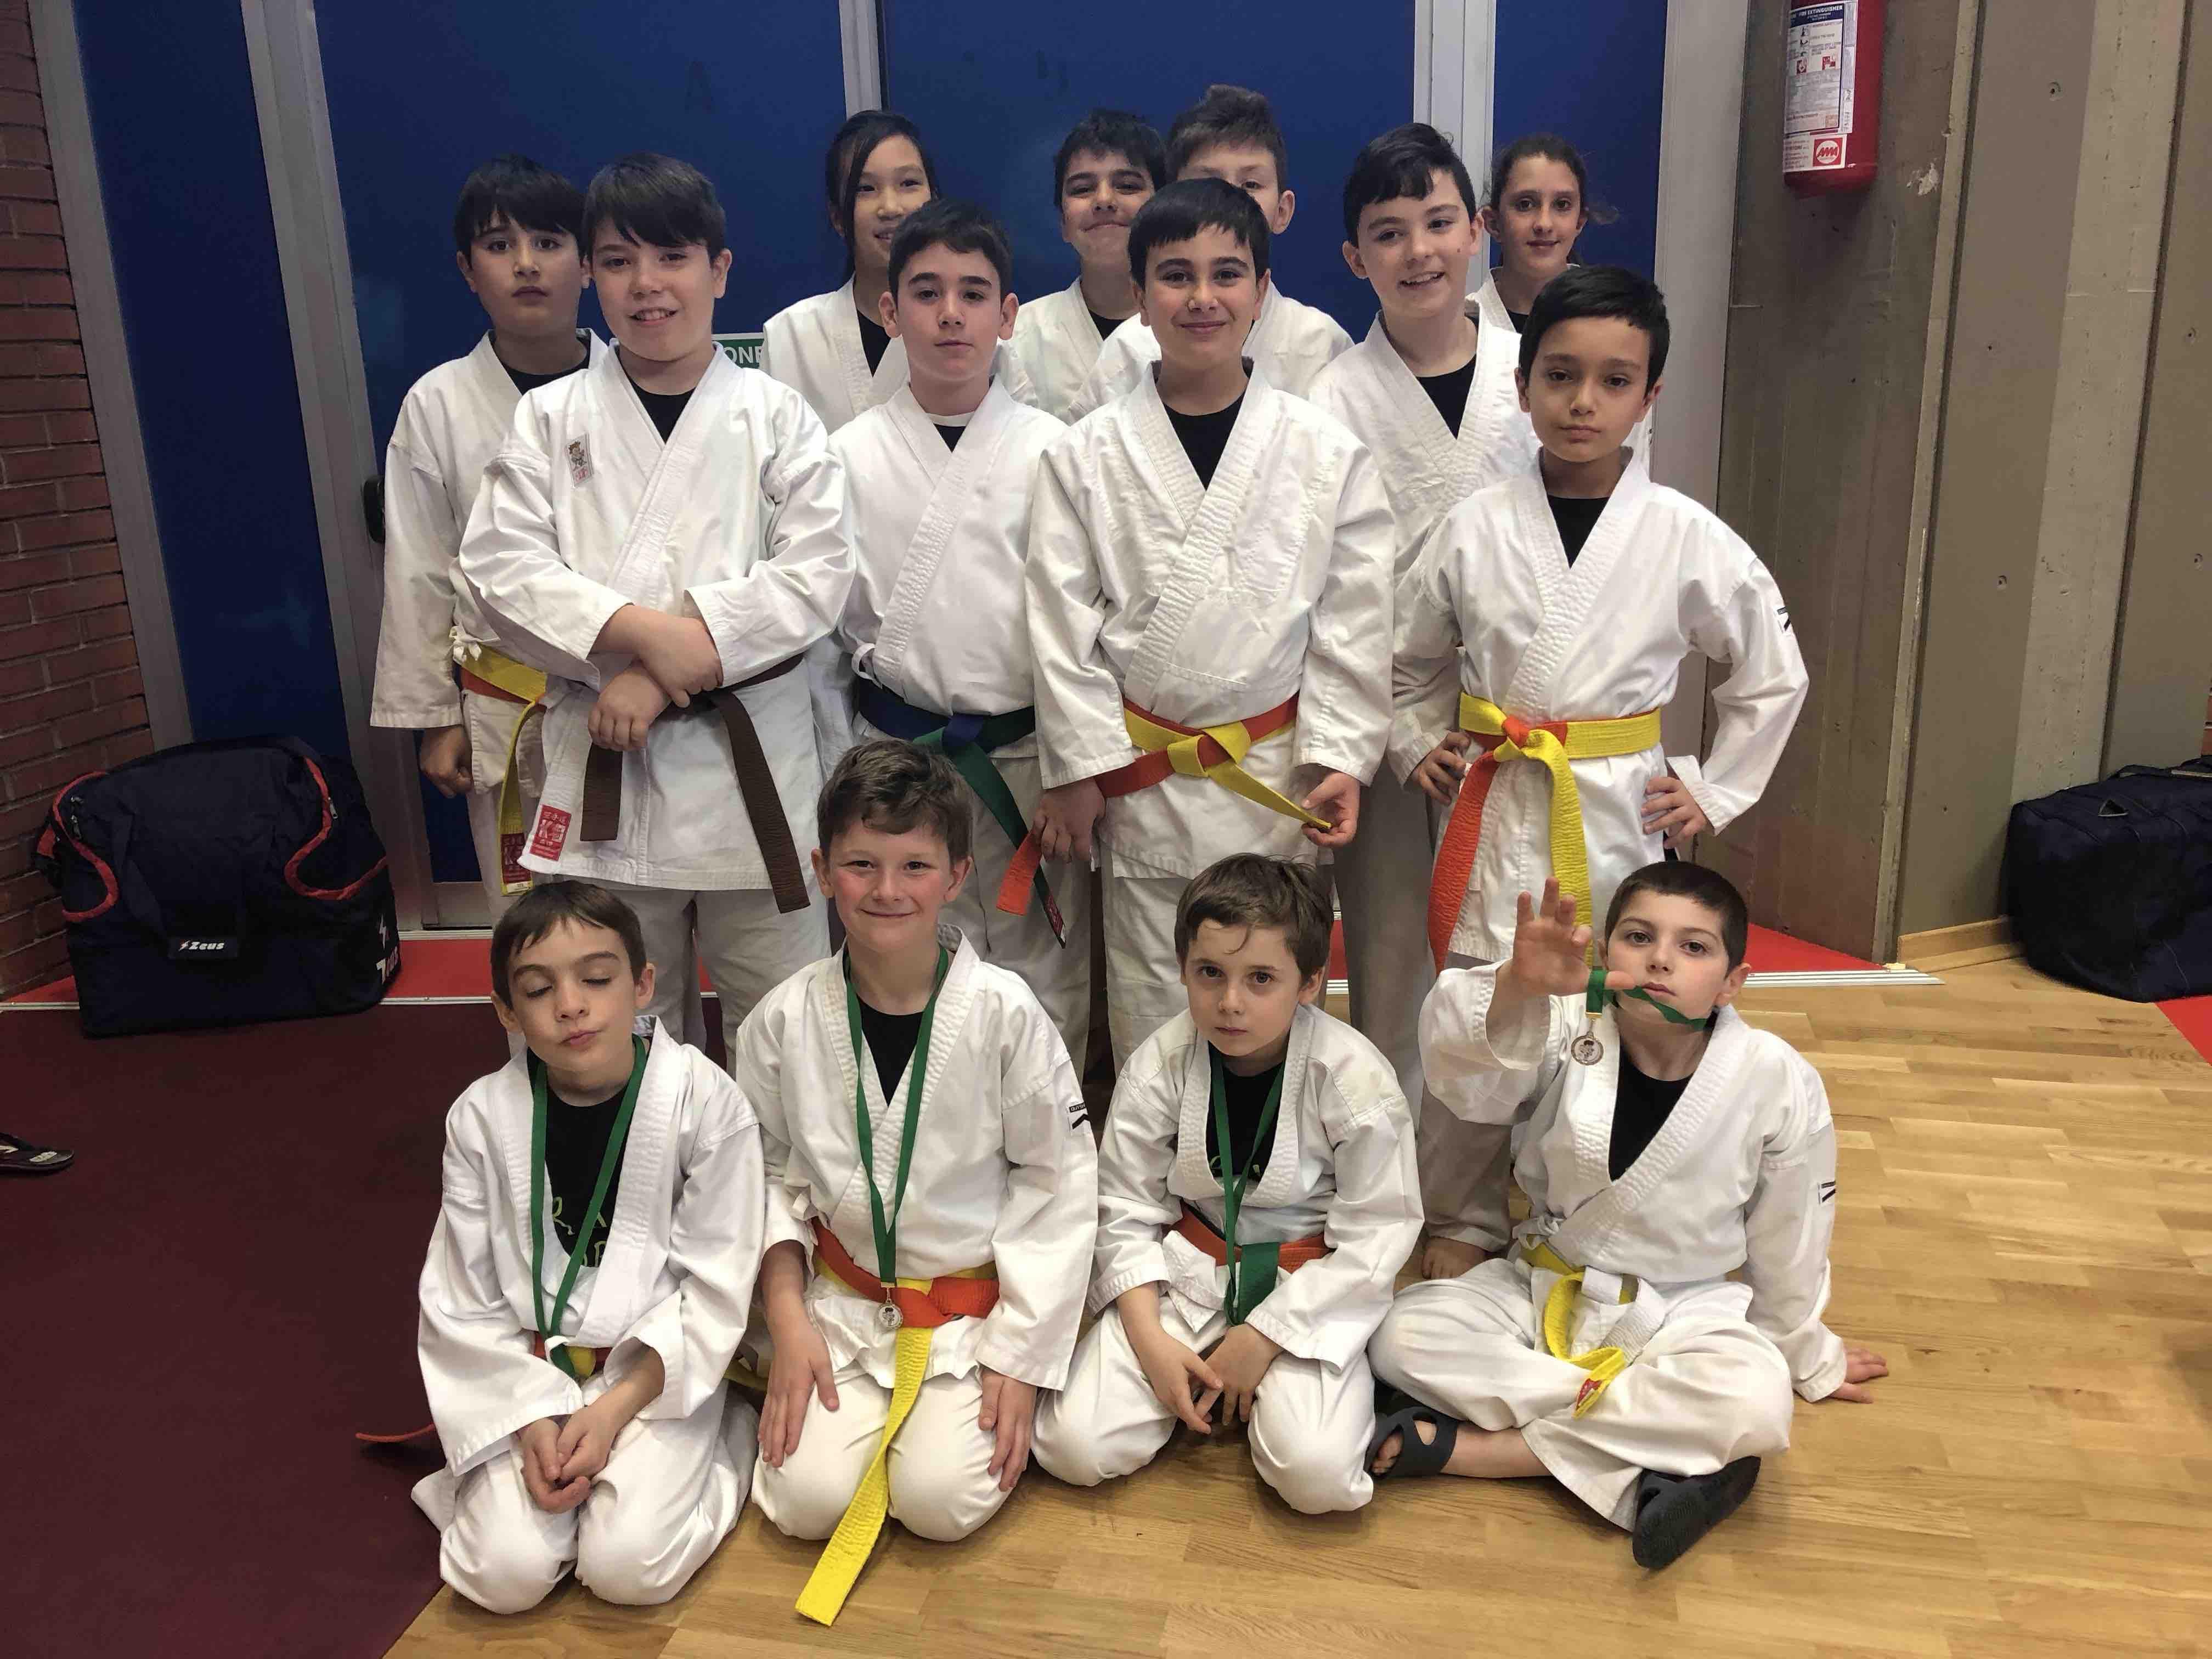 Fijlkam Karate Calendario Gare 2020.Karate Palestra Europa Grosseto In Luce A Sesto Fiorentino